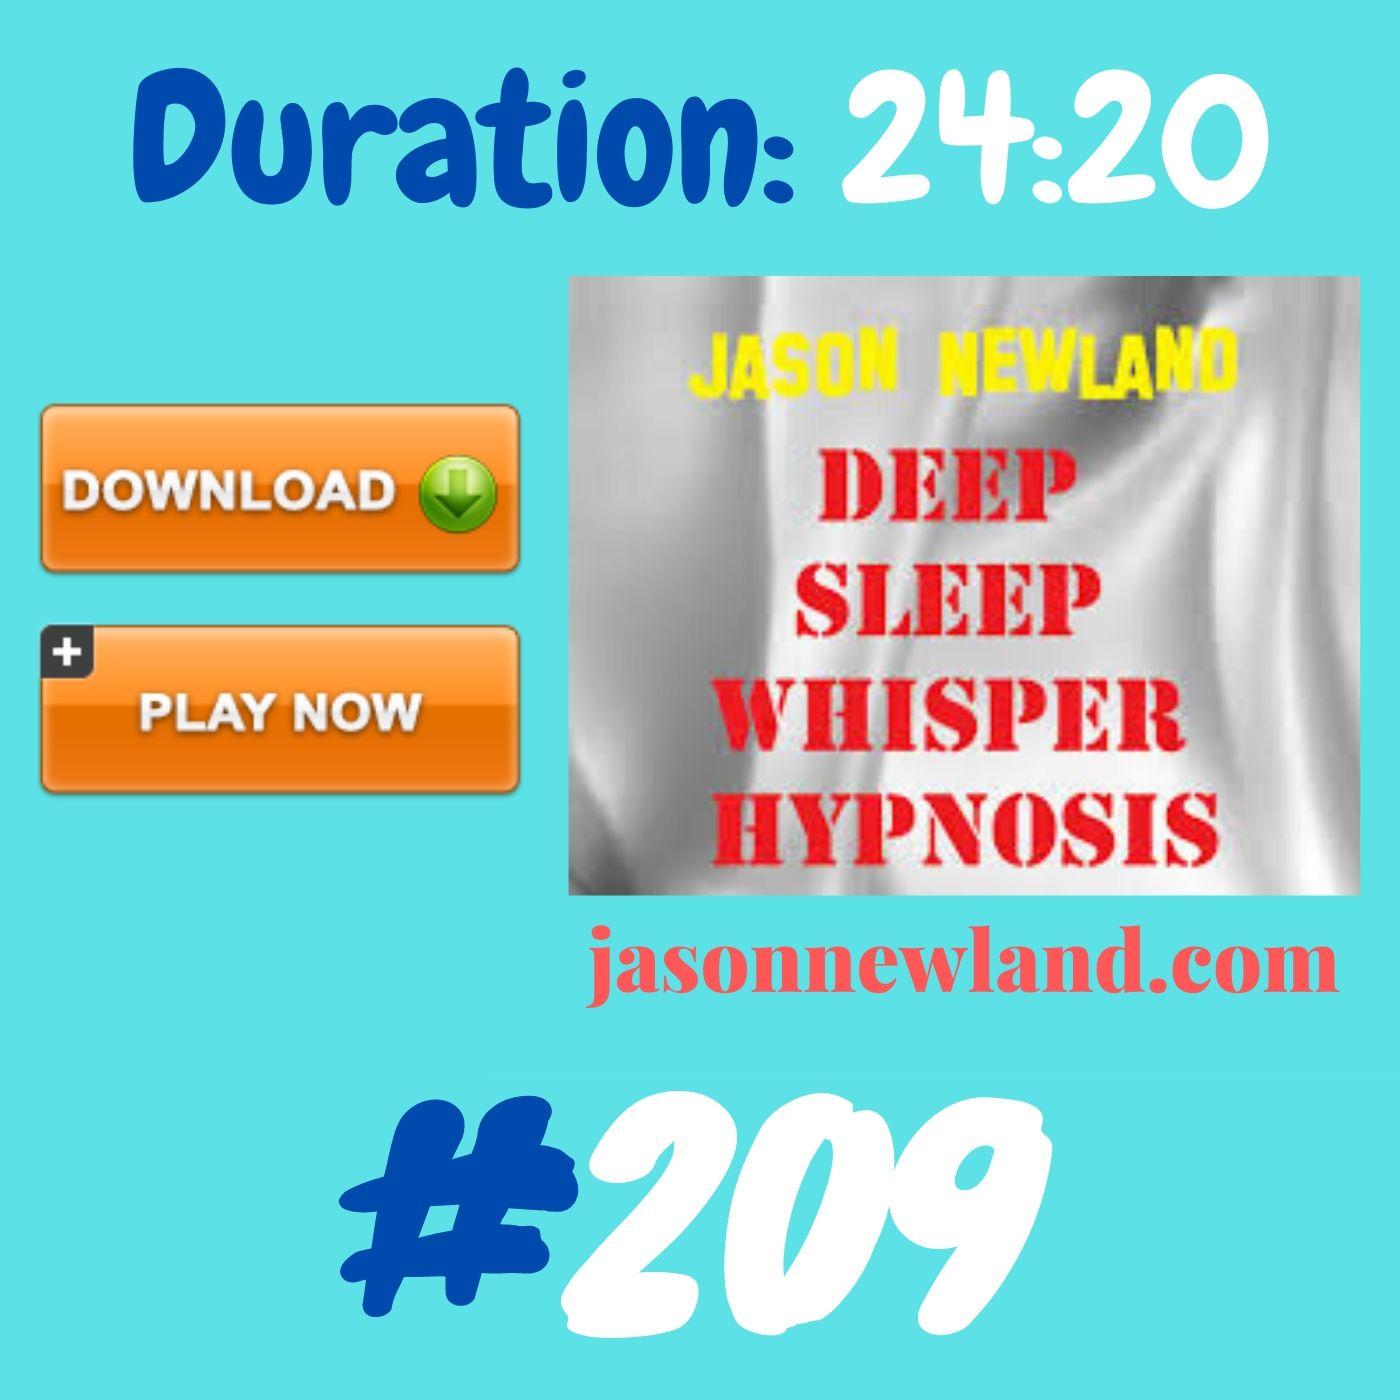 #358 Deep Sleep Whisper Hypnosis (Jason Newland) with MUSIC